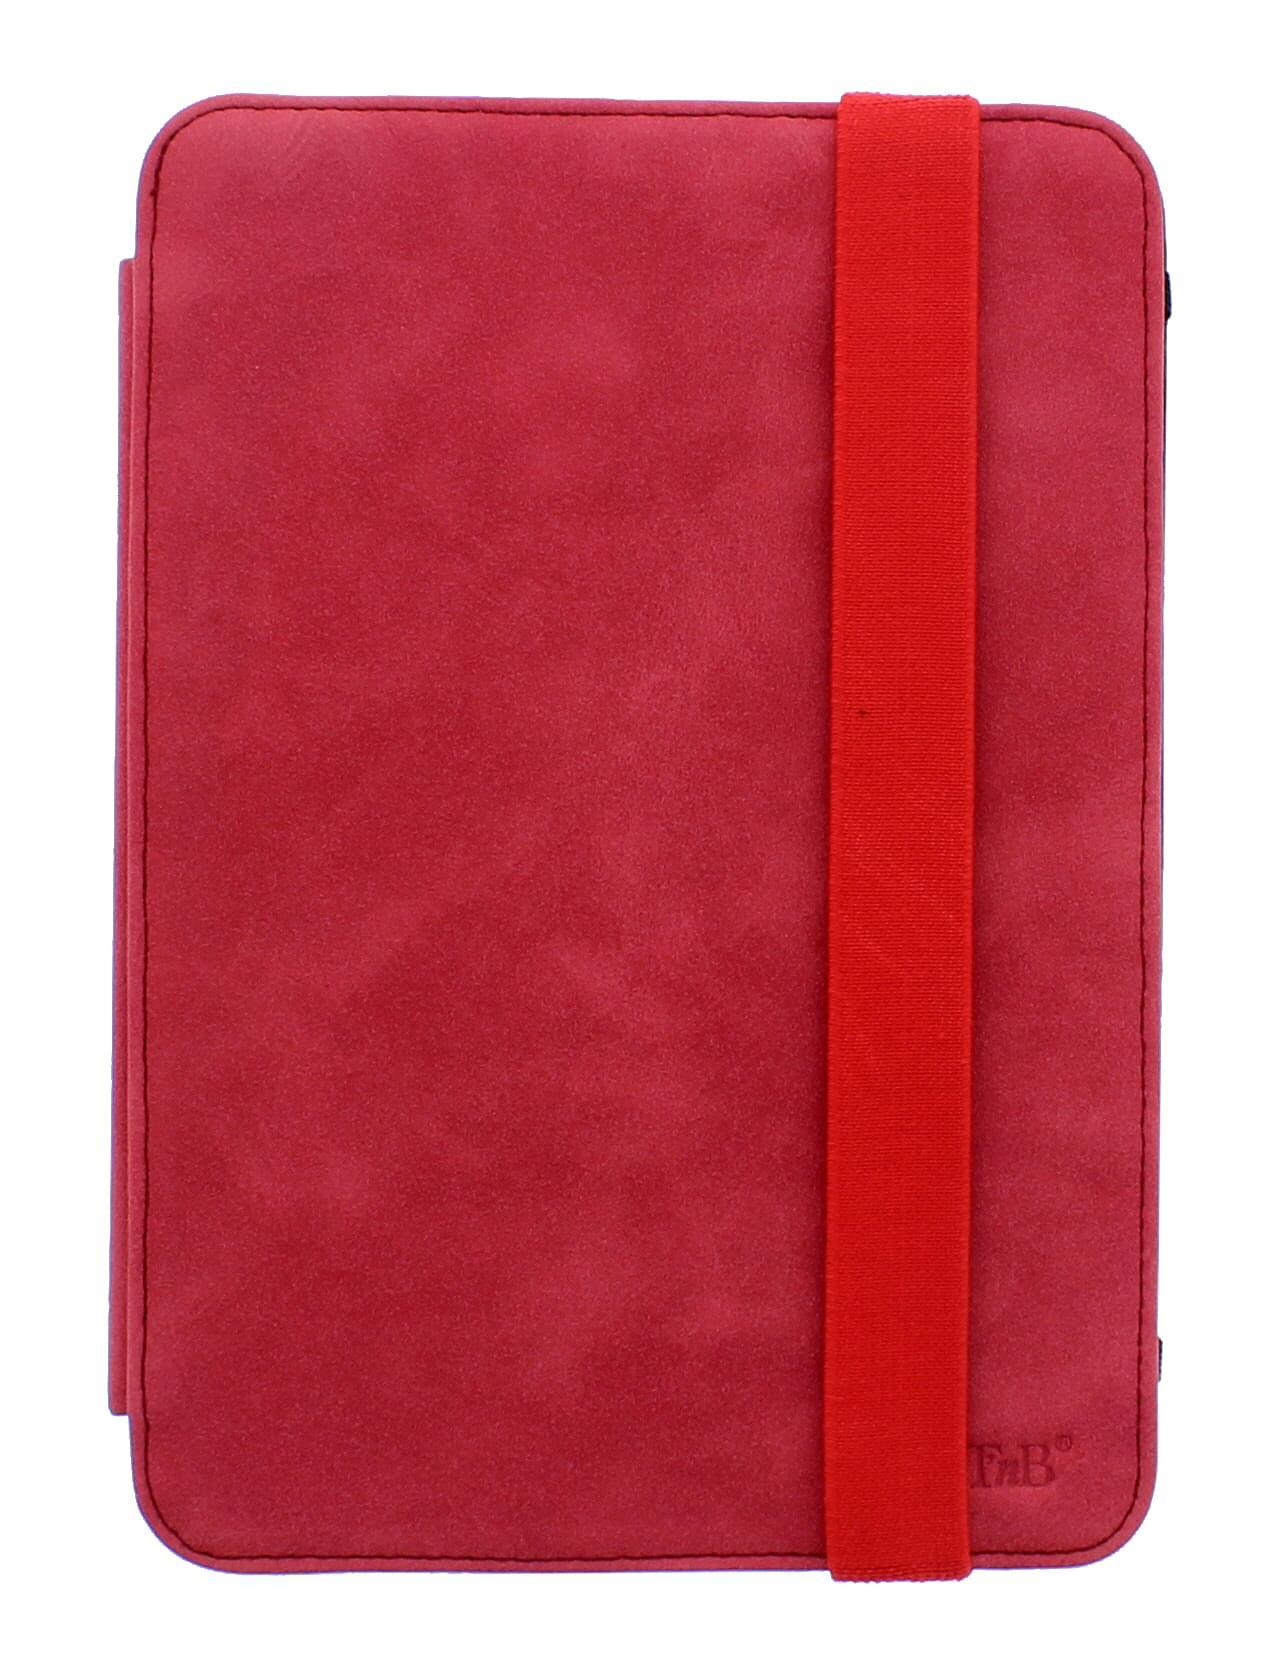 "Sweet Etui Folio universel 10"" Rouge - Accessoire tablette T'nB - 0"